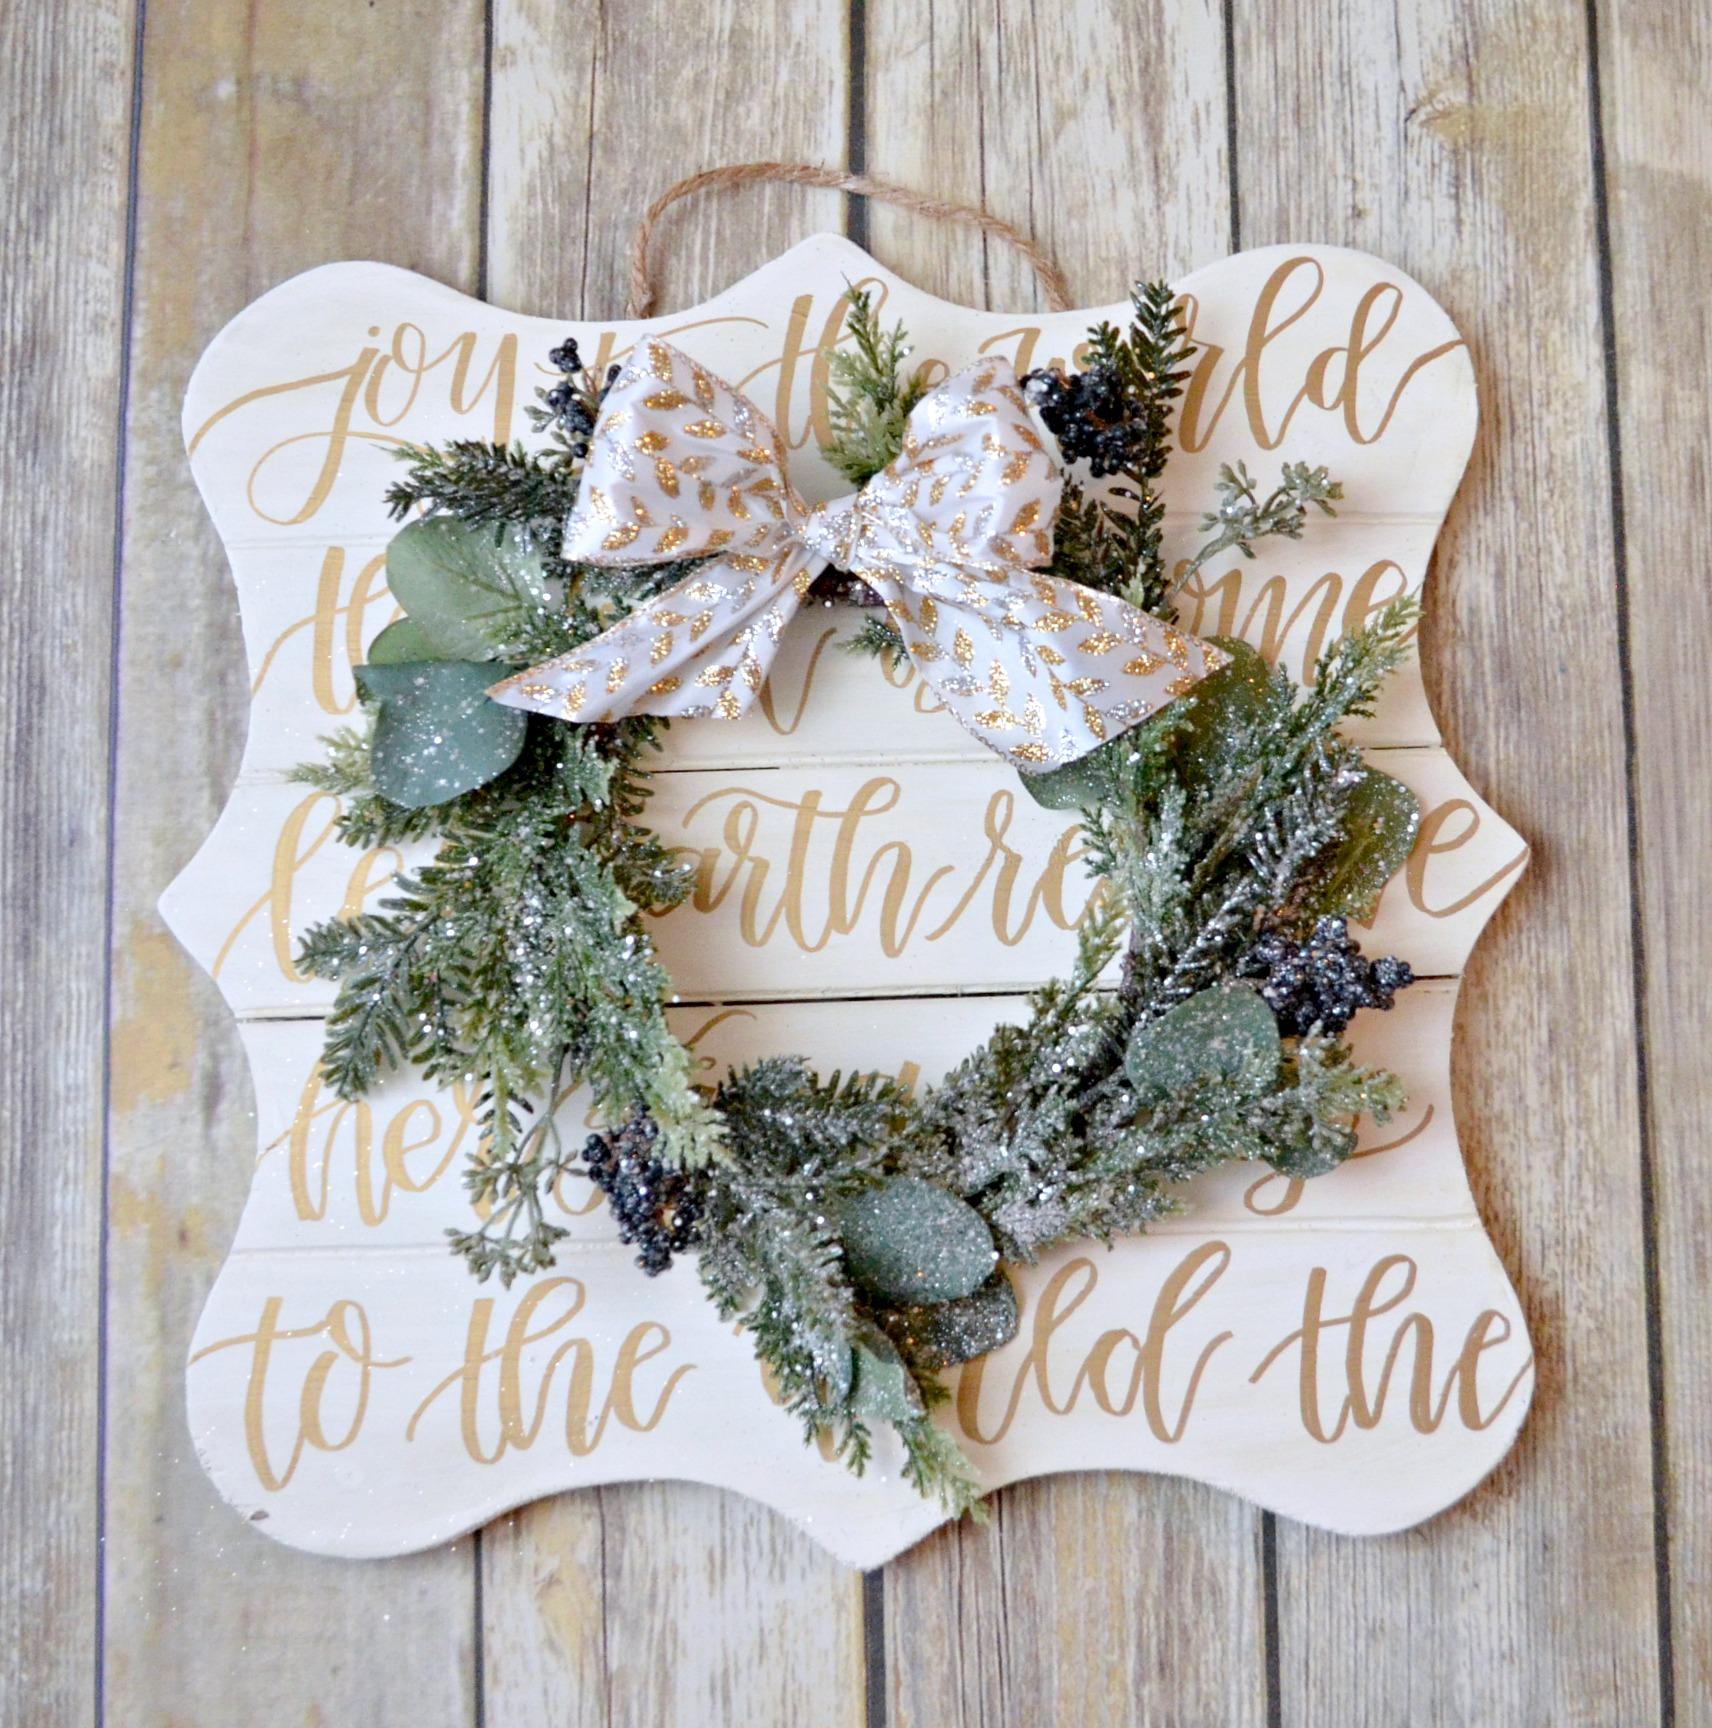 JOY Hand Lettered Christmas Wreath